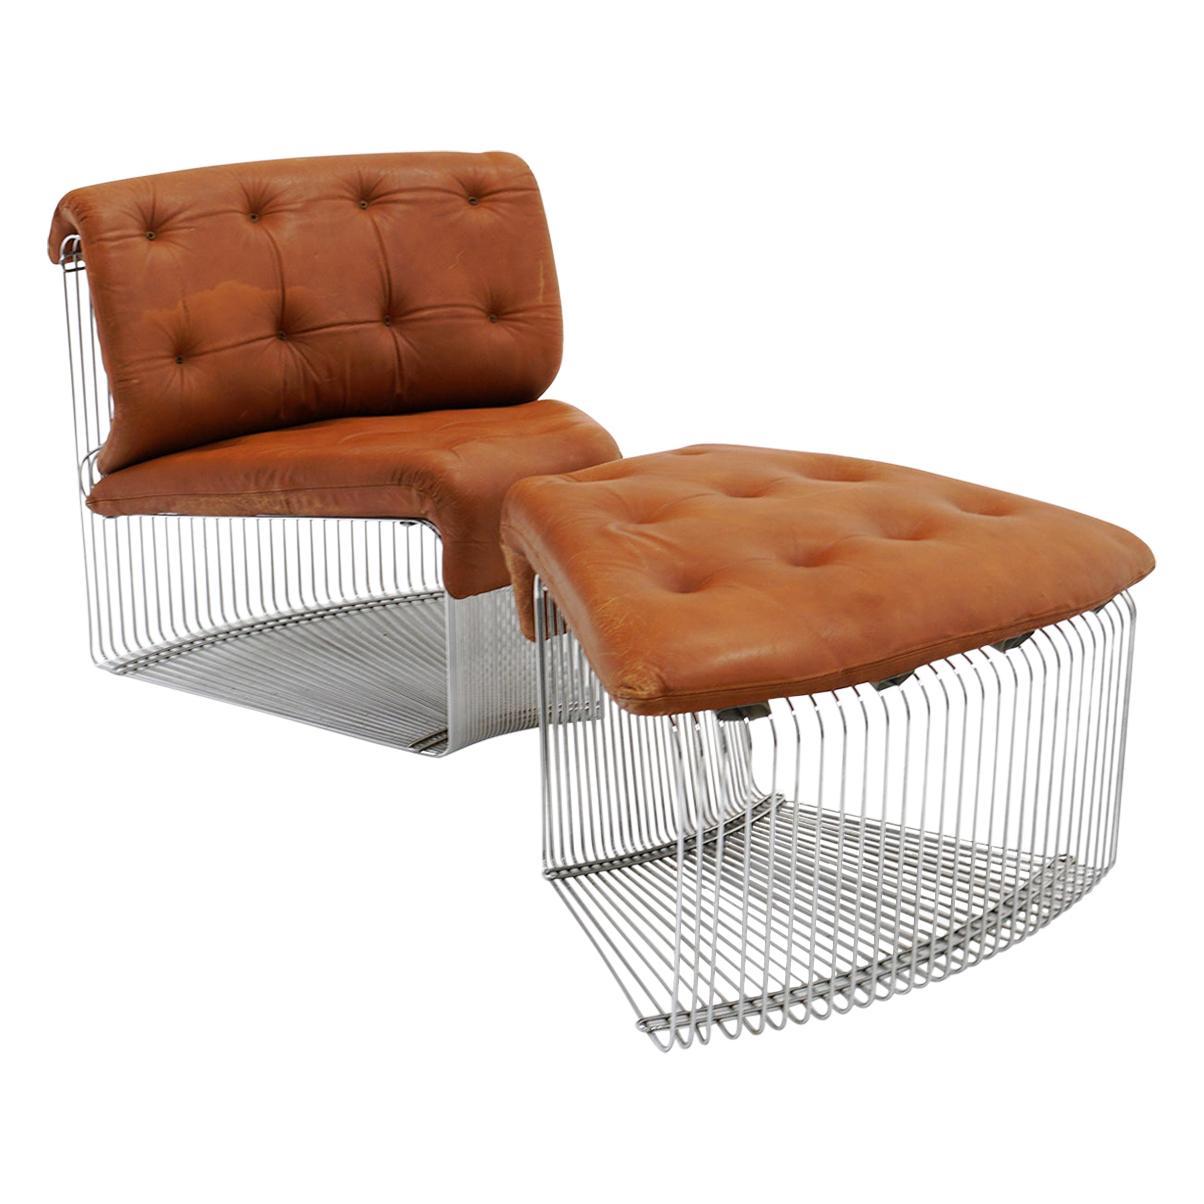 Pantonova Chair and Ottoman by Verner Panton, Chrome Steel and Cognac Leather